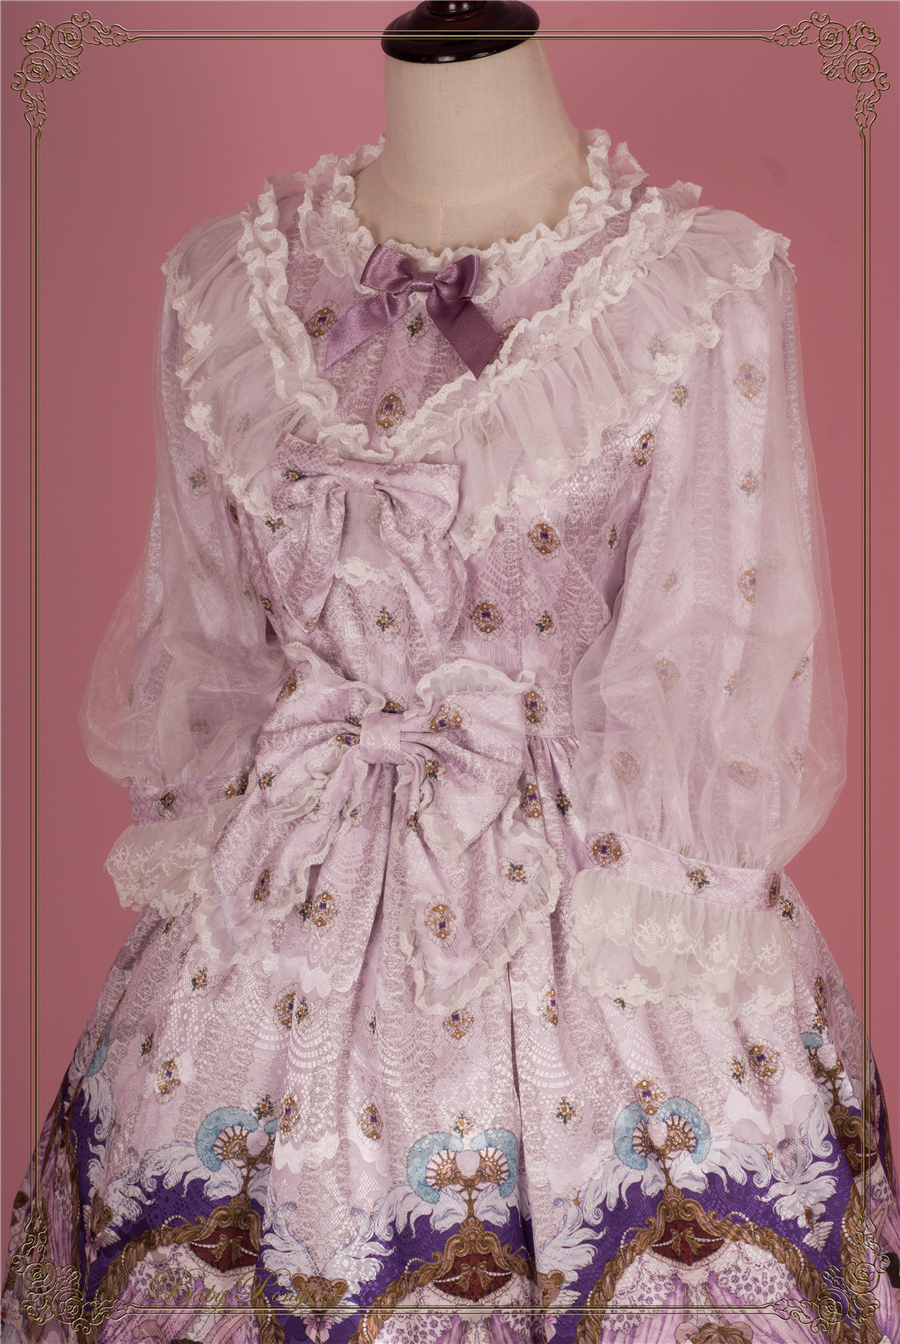 BabyPonytail_Stock Photo_My Favorite Companion_OP Lavender_04.jpg